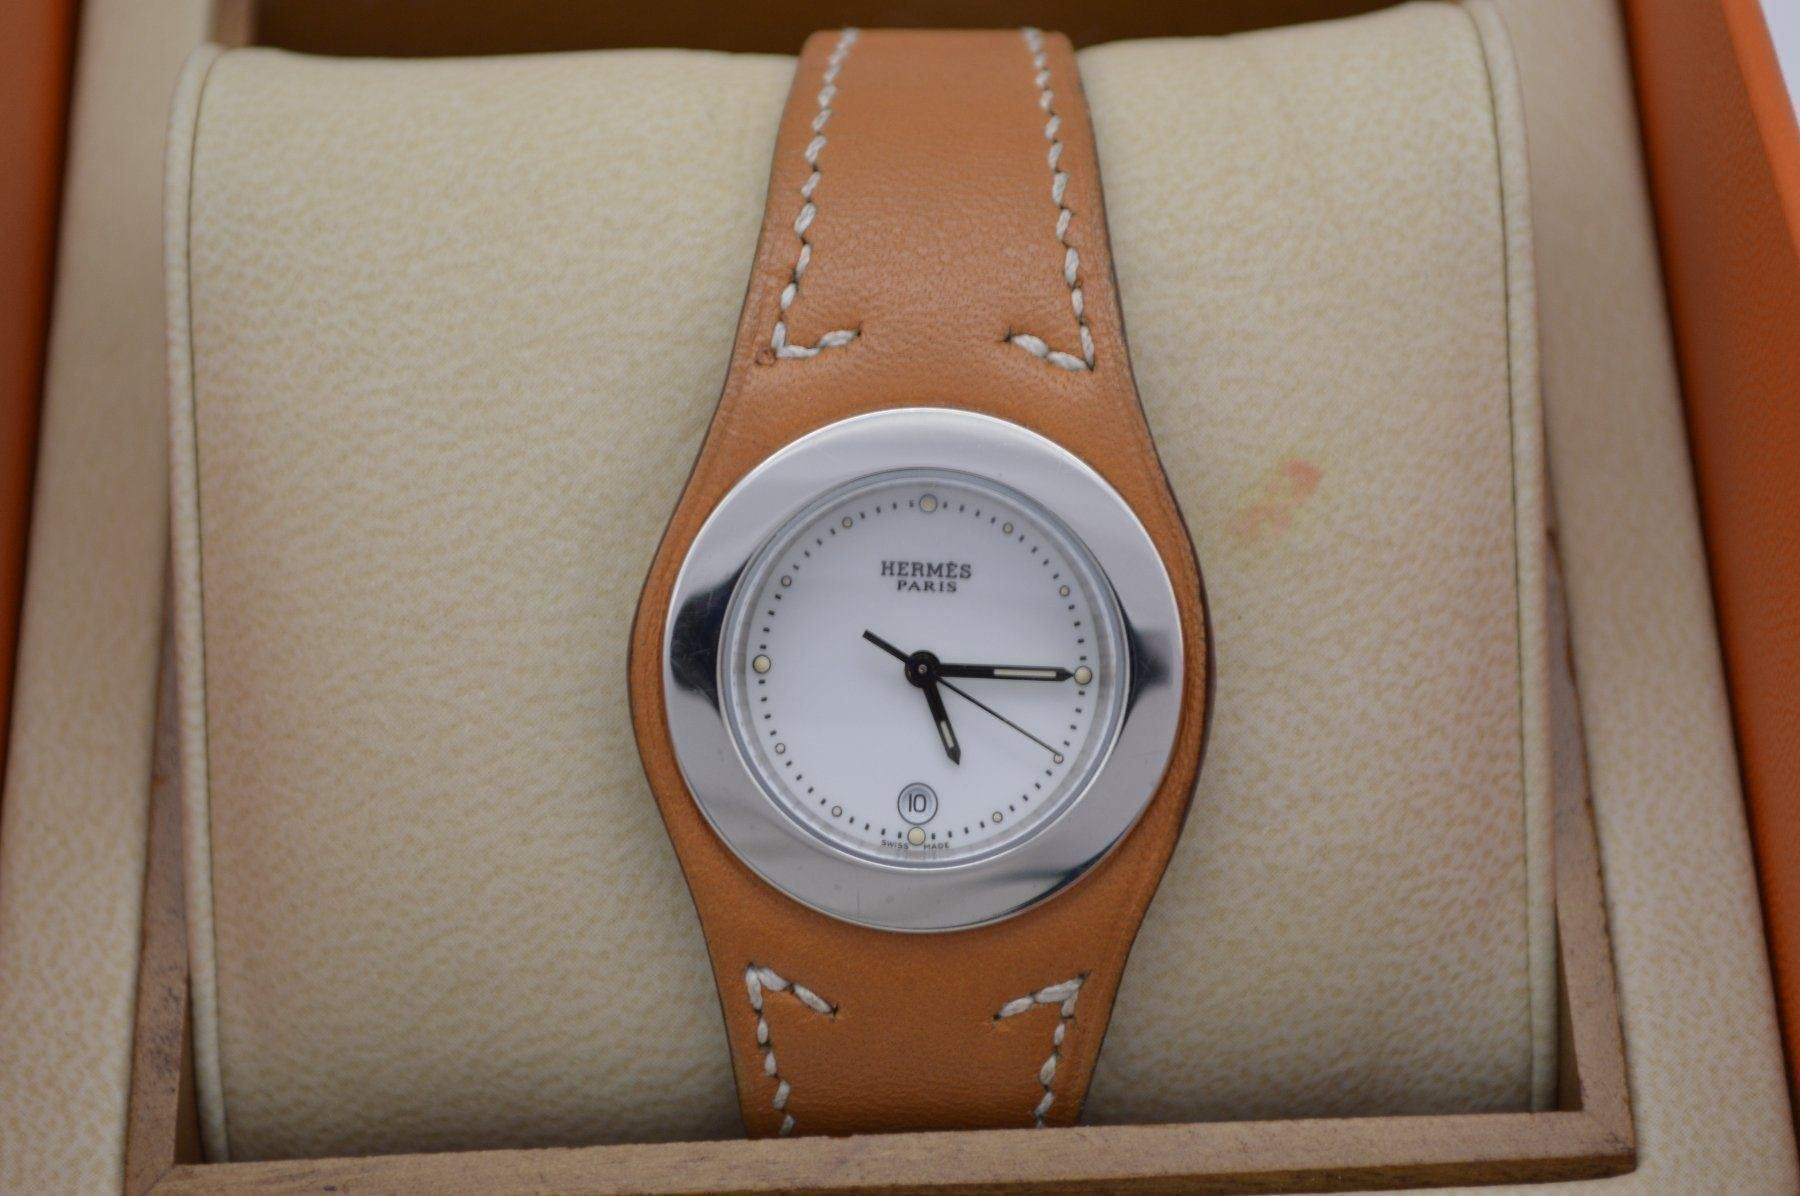 Herms / Harnais HA3.210 - Lady's Steel Wrist Watch - Image 6 of 6